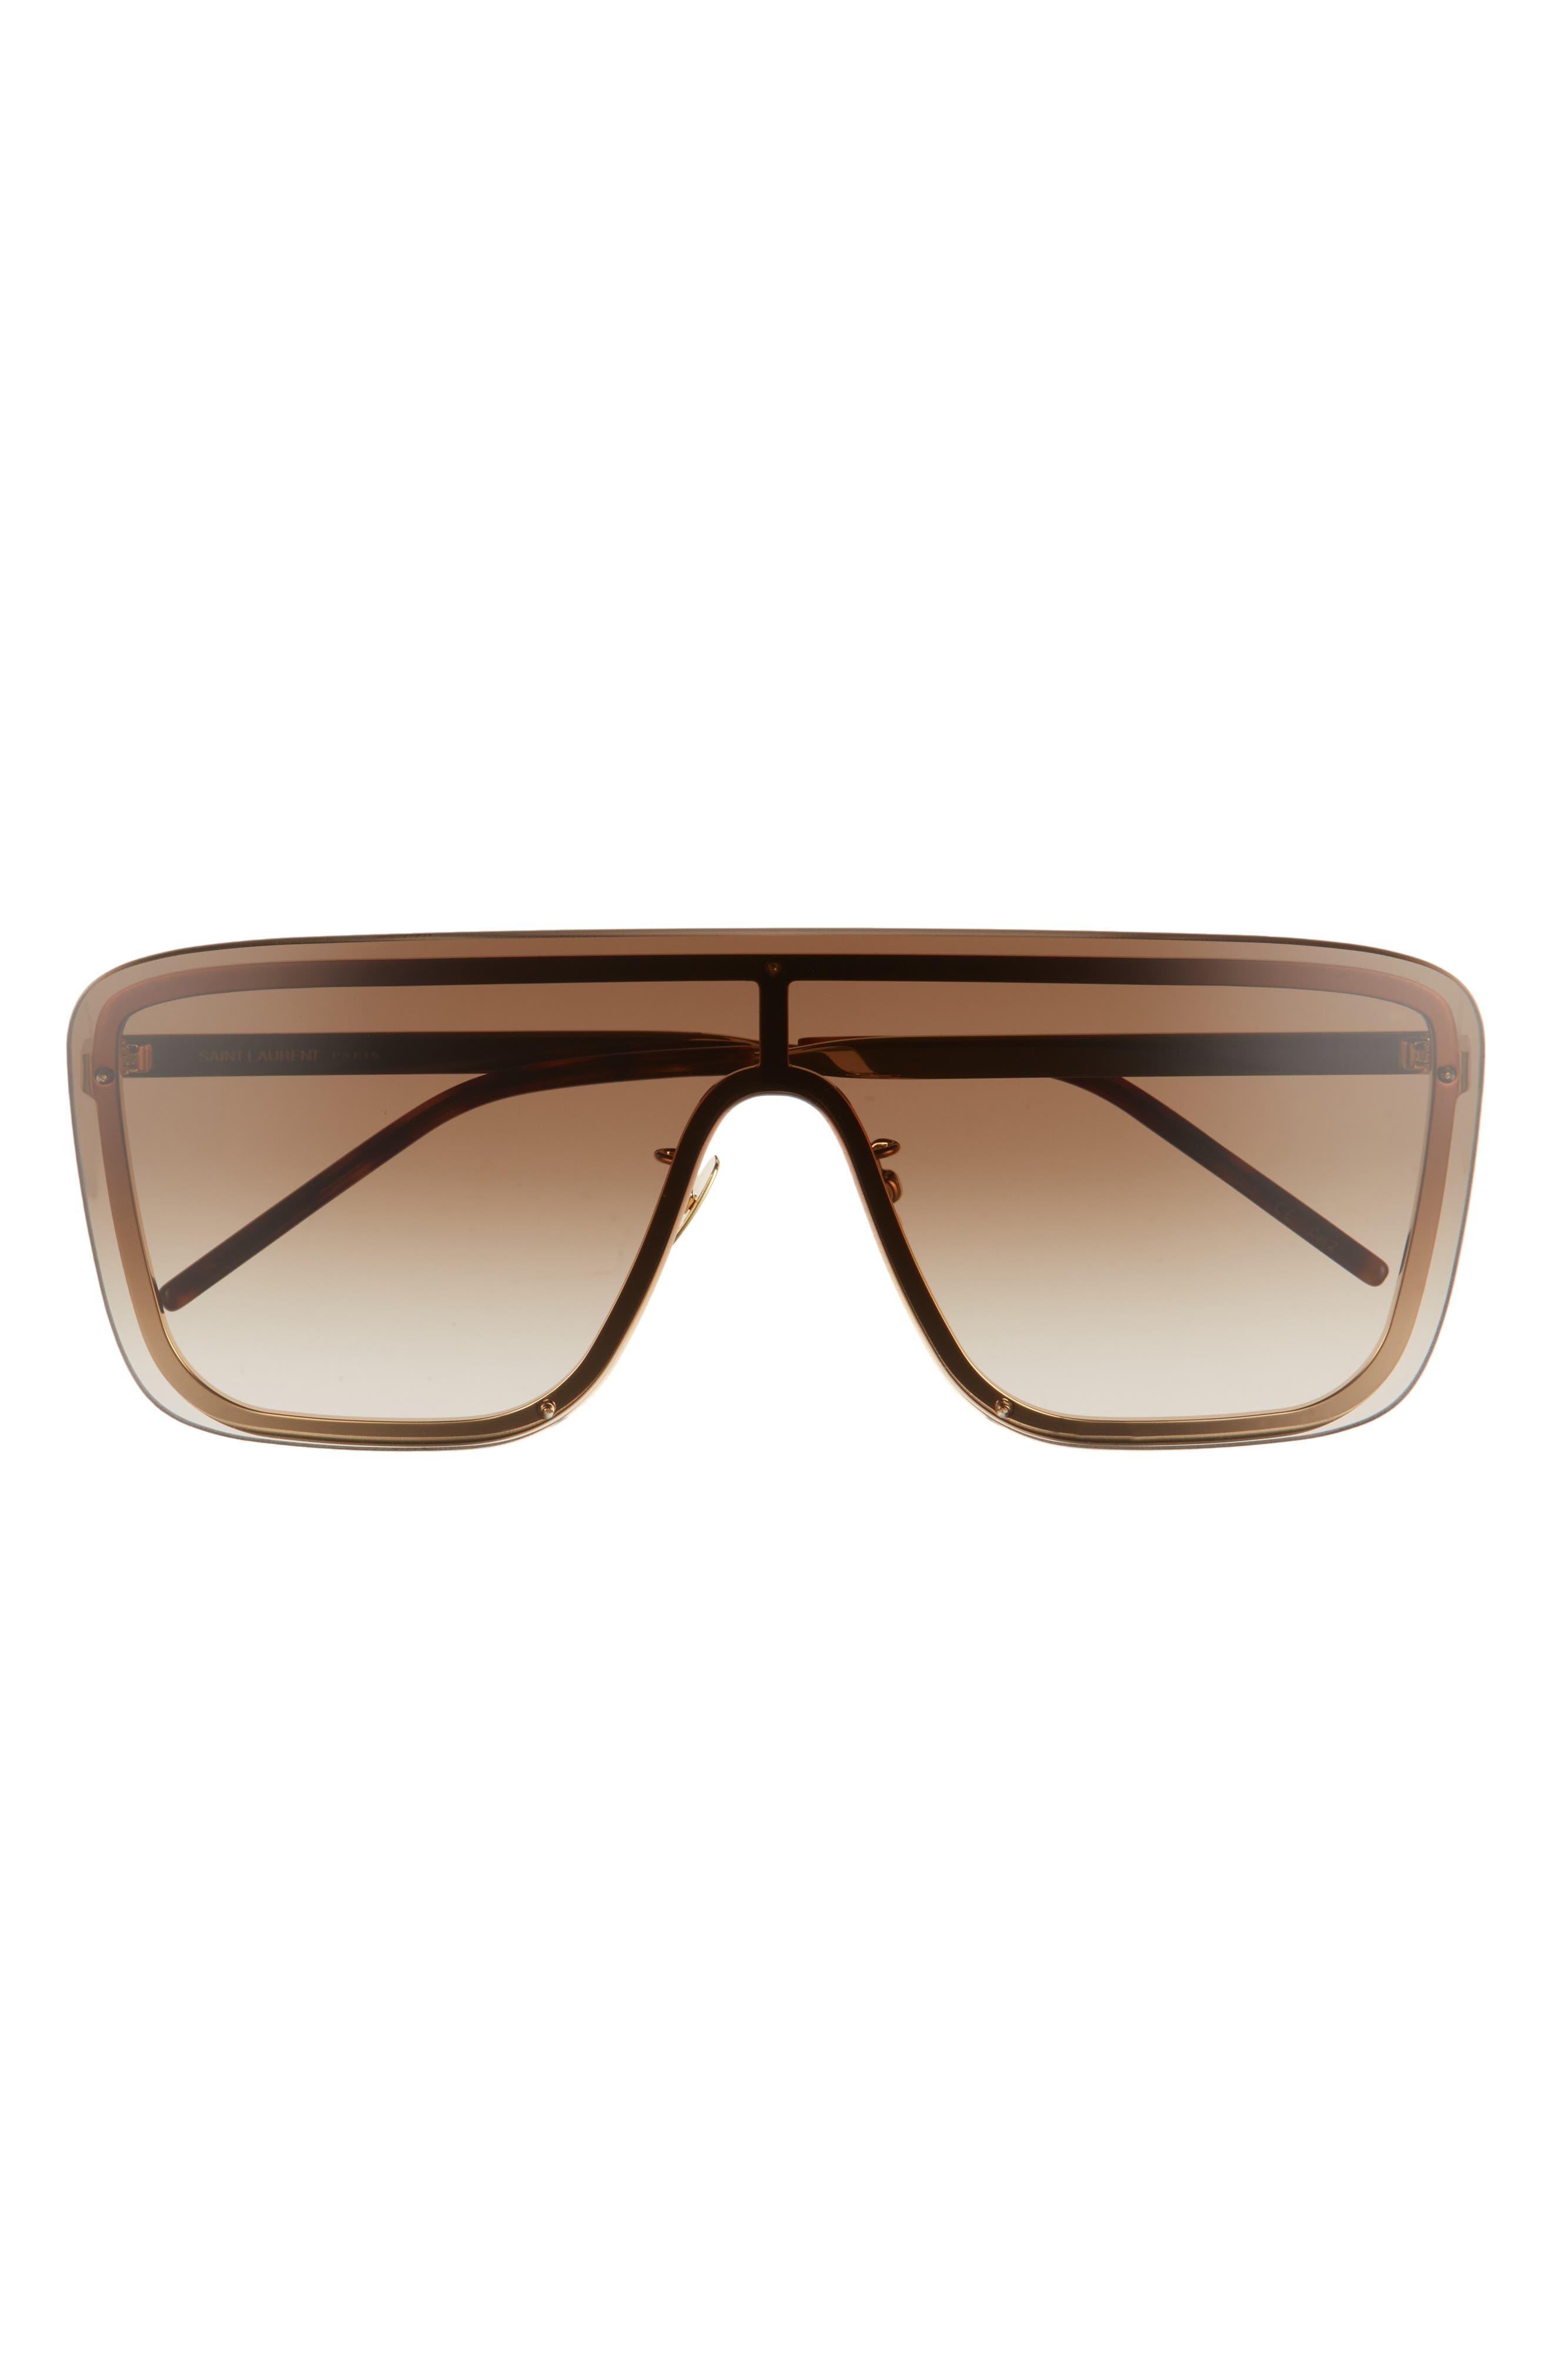 Women's Saint Laurent 99mm Flat Top Shield Sunglasses - Light Gold/ Brown